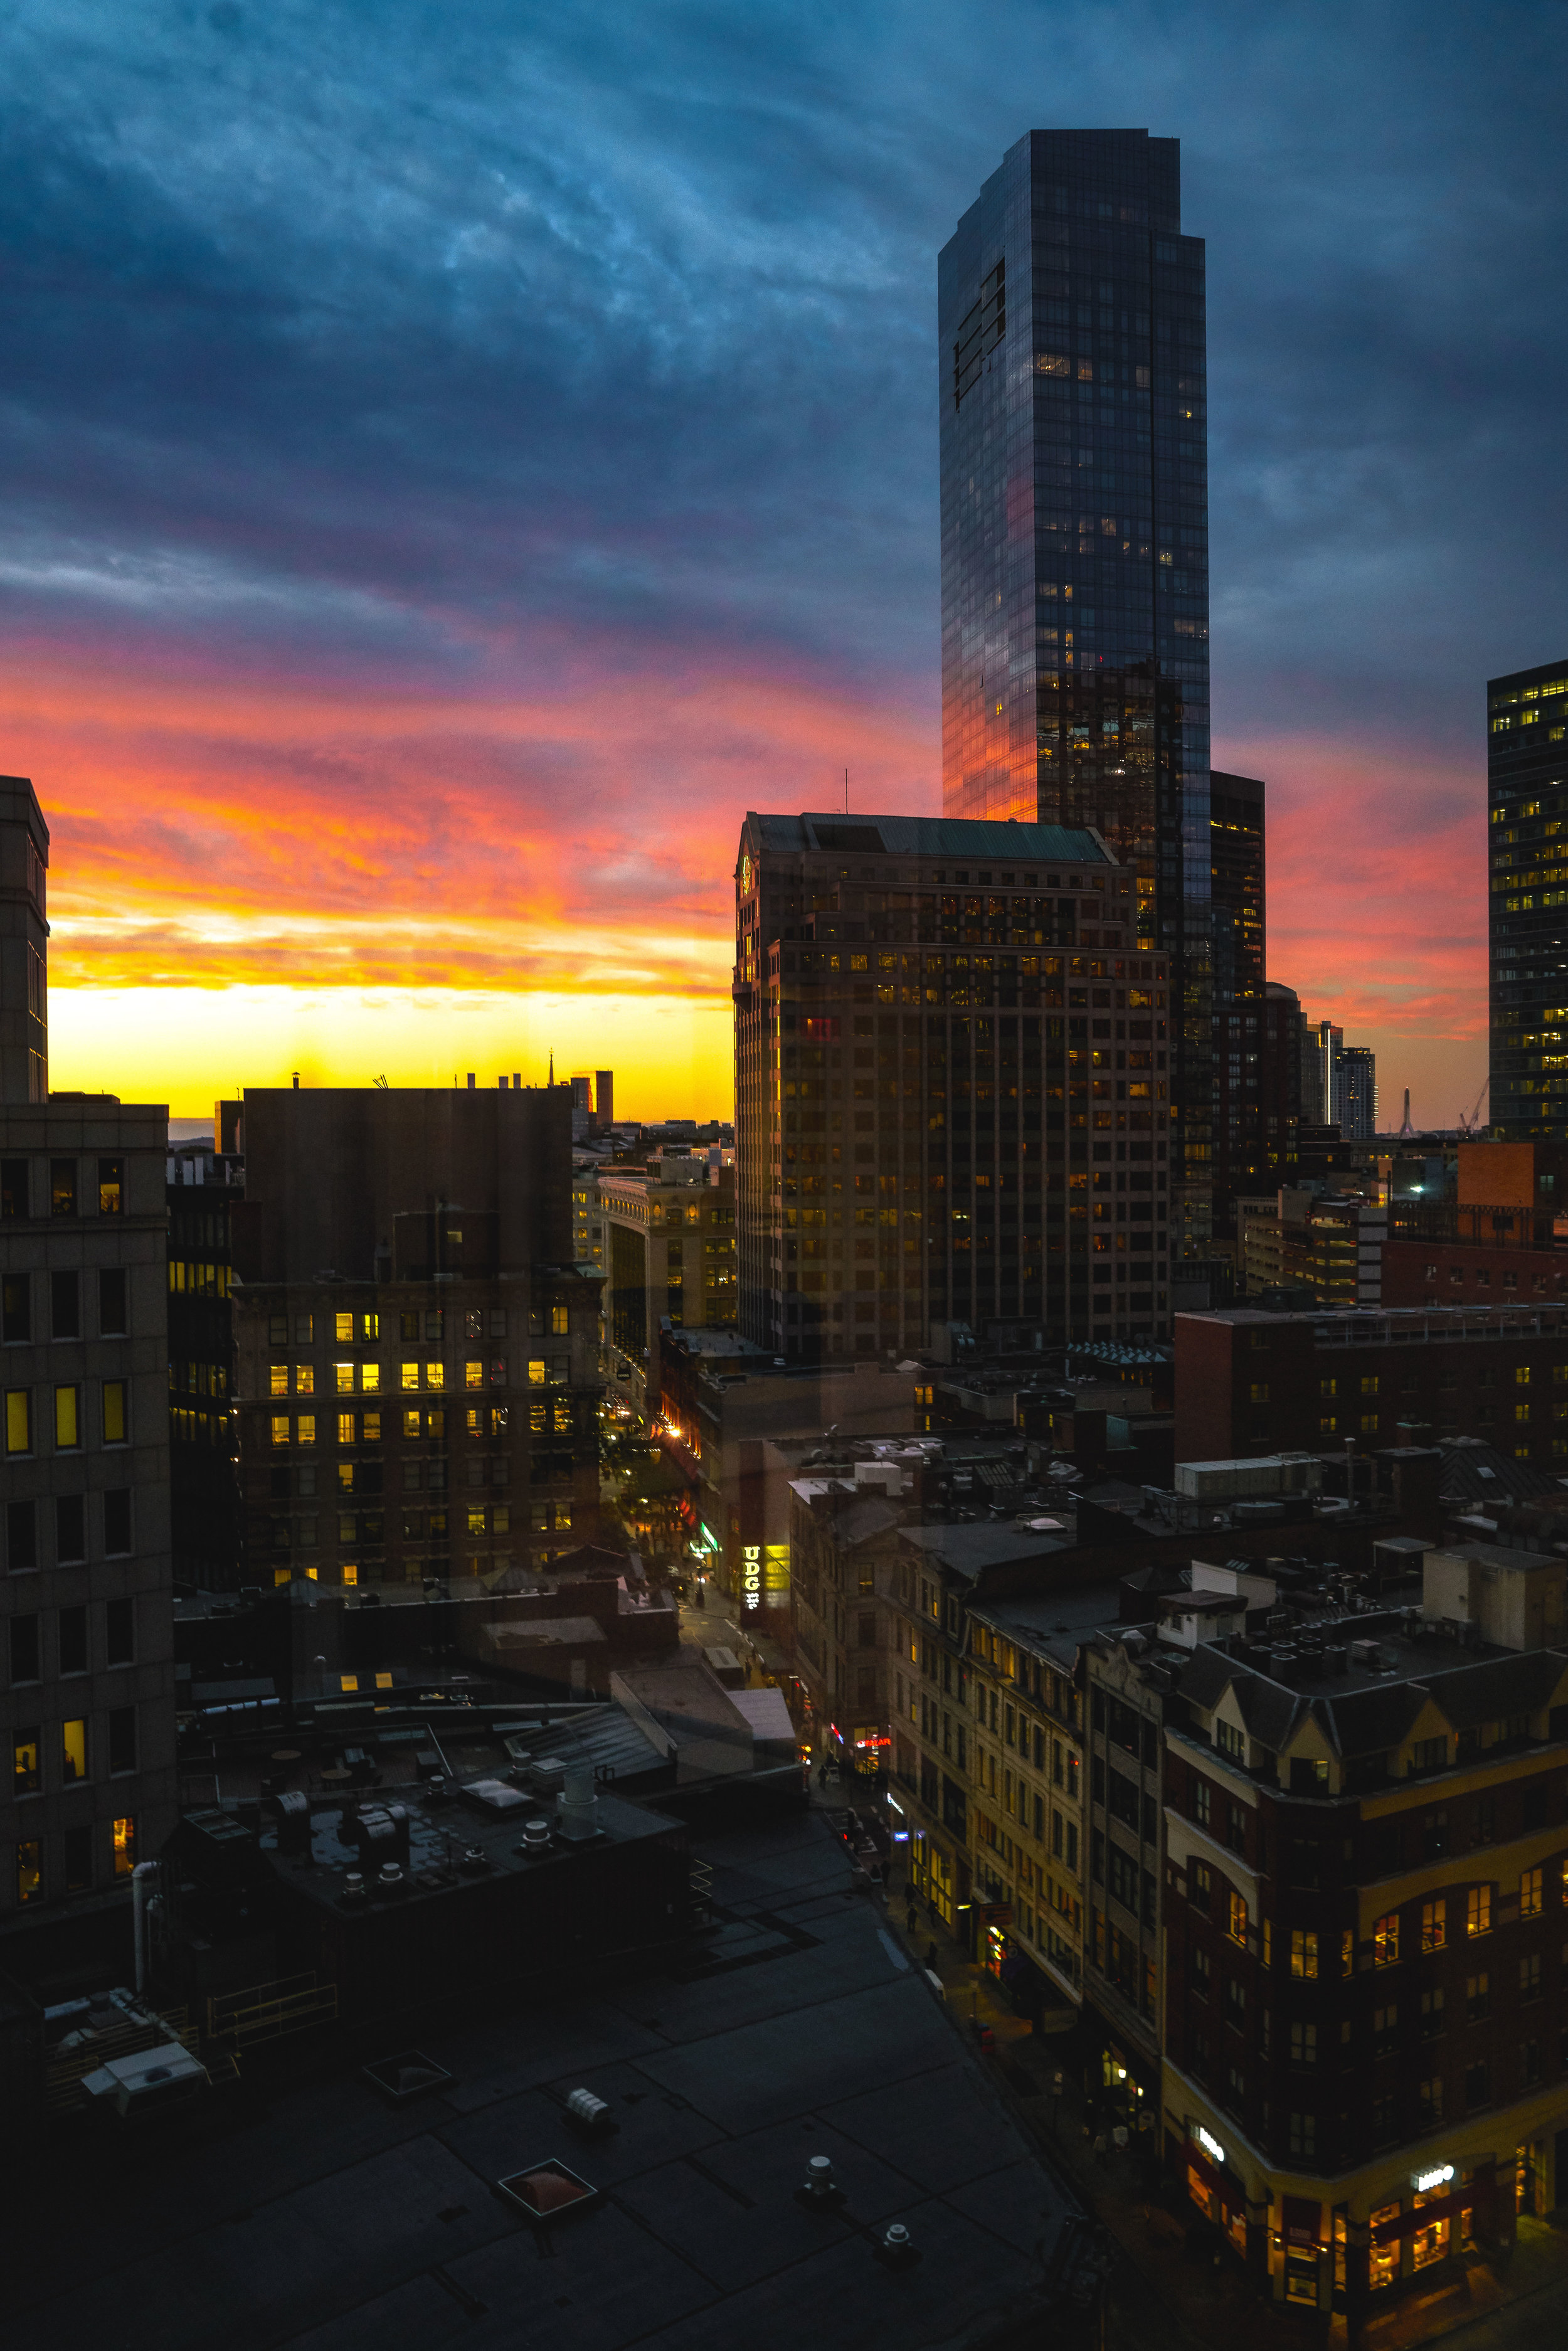 @themiclangelo - Downtown Boston, MA